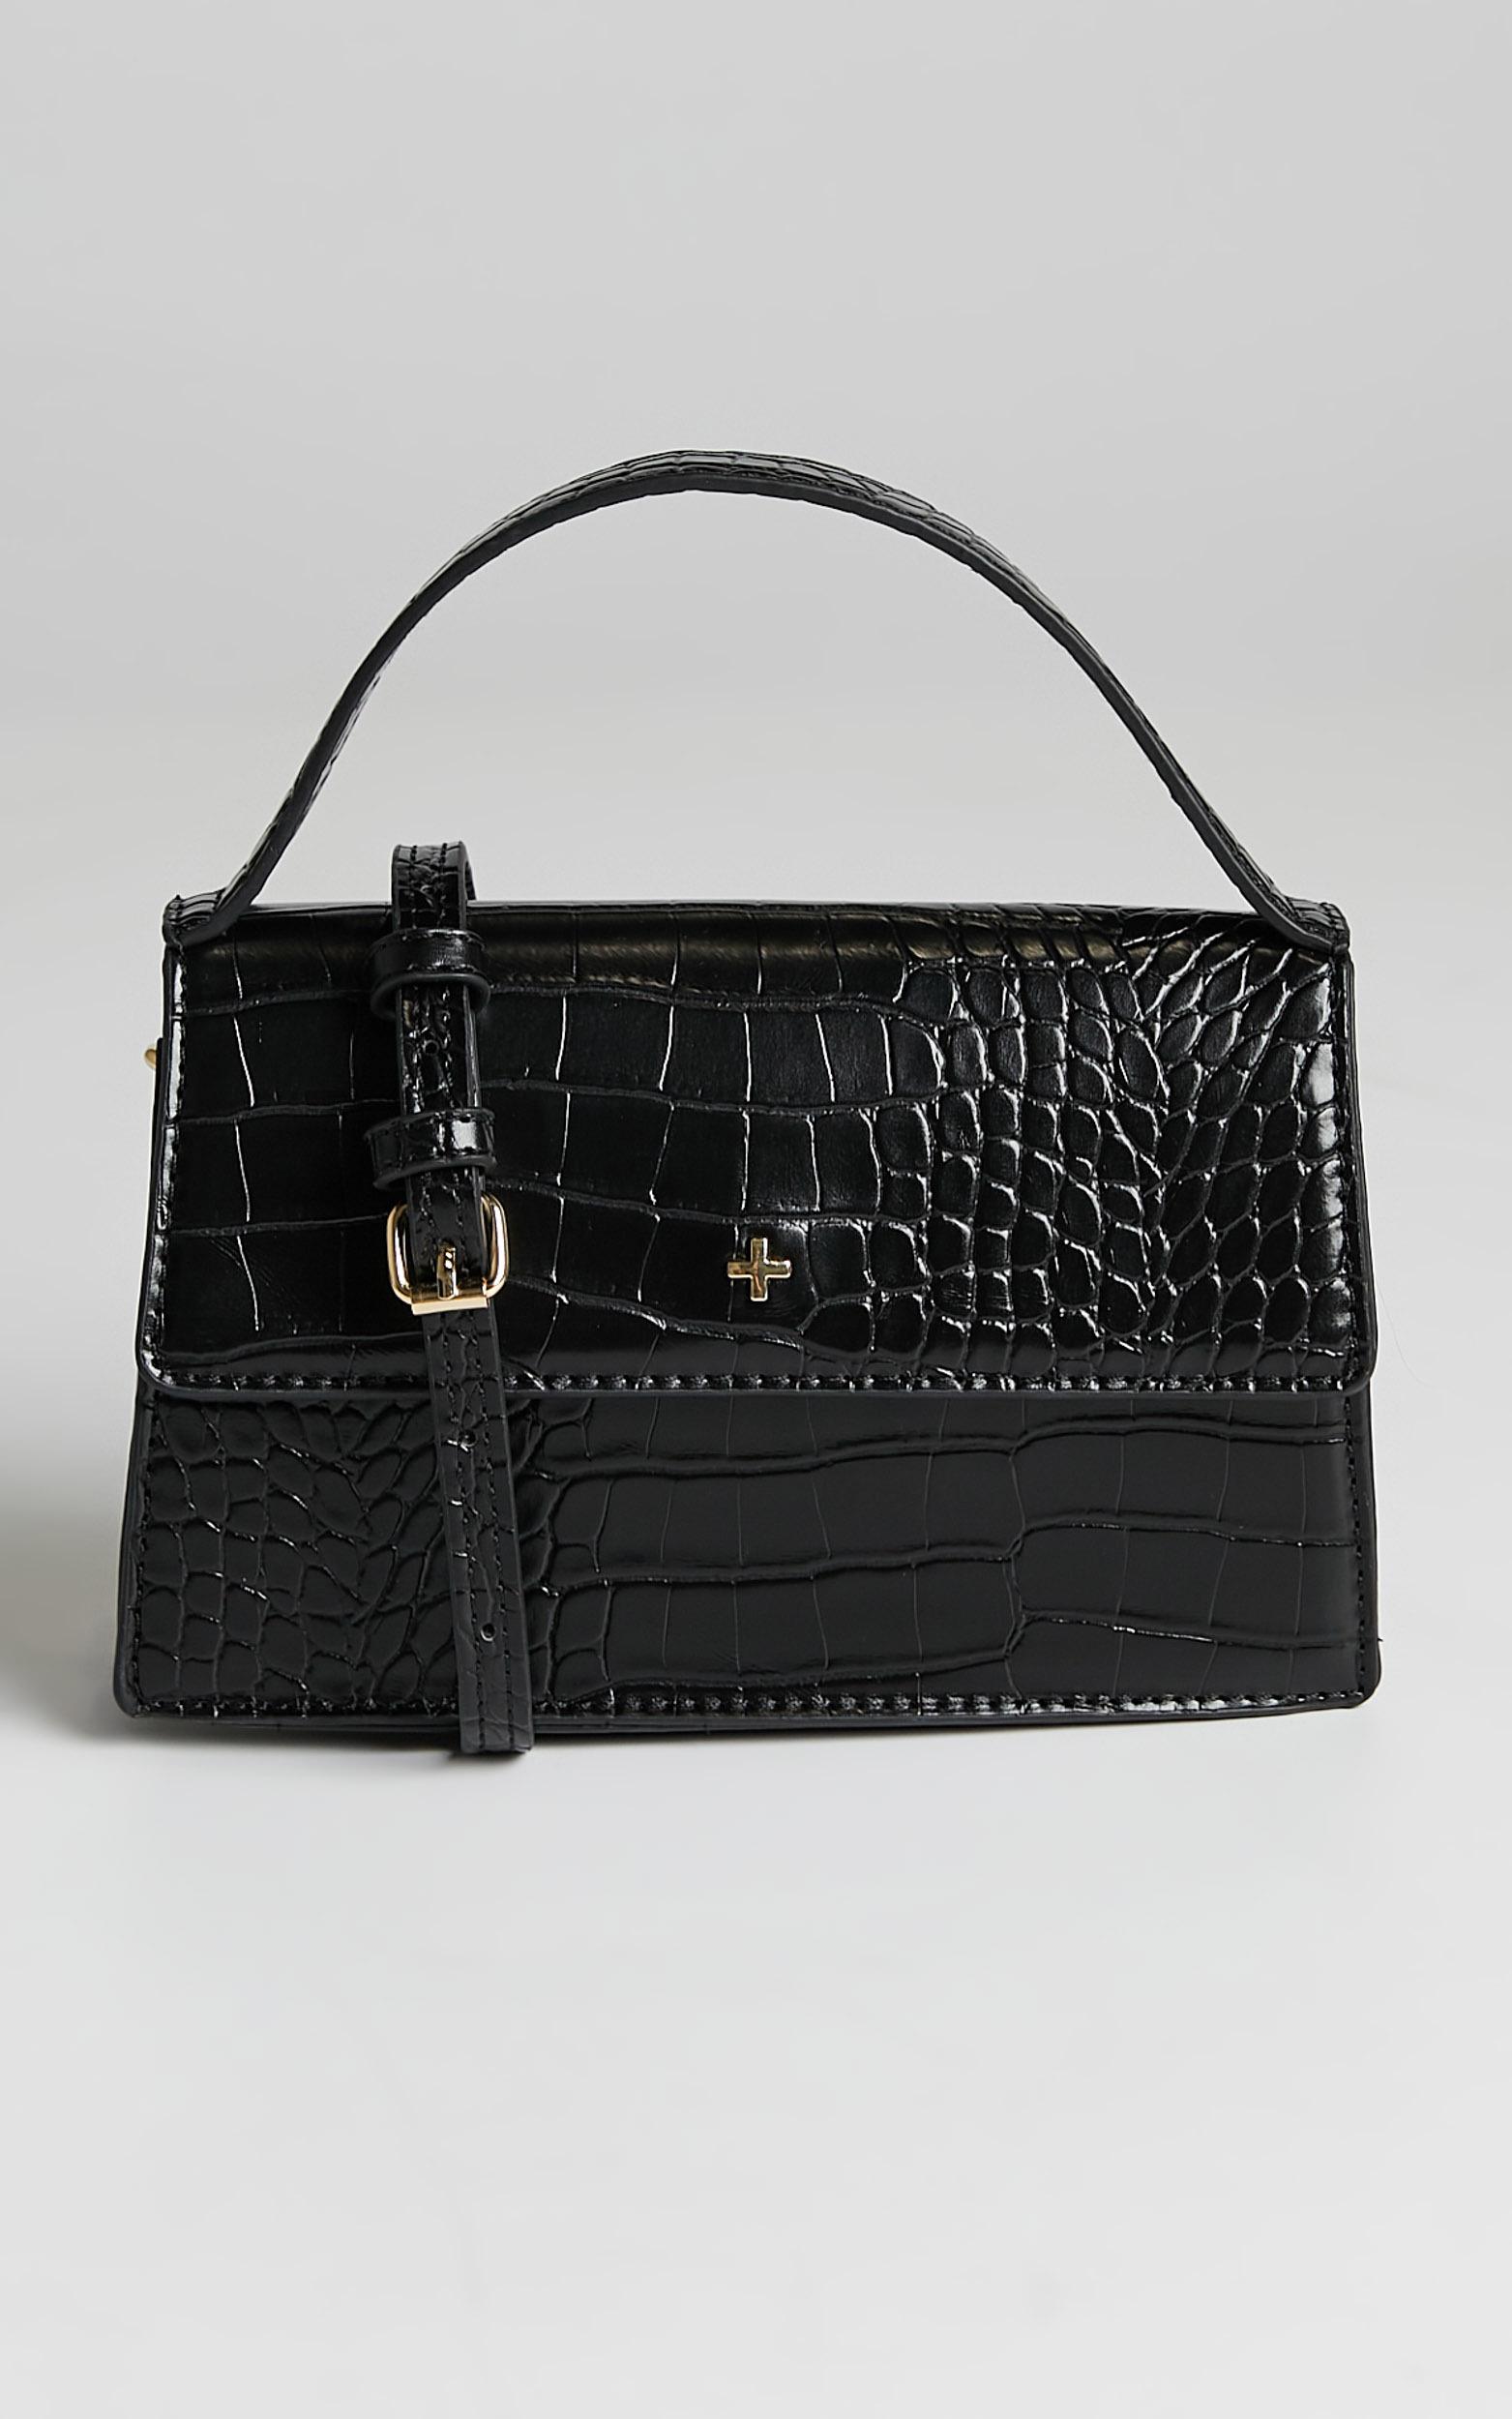 Peta And Jain - Alys Bag in Black Croc - OneSize, BLK1, hi-res image number null